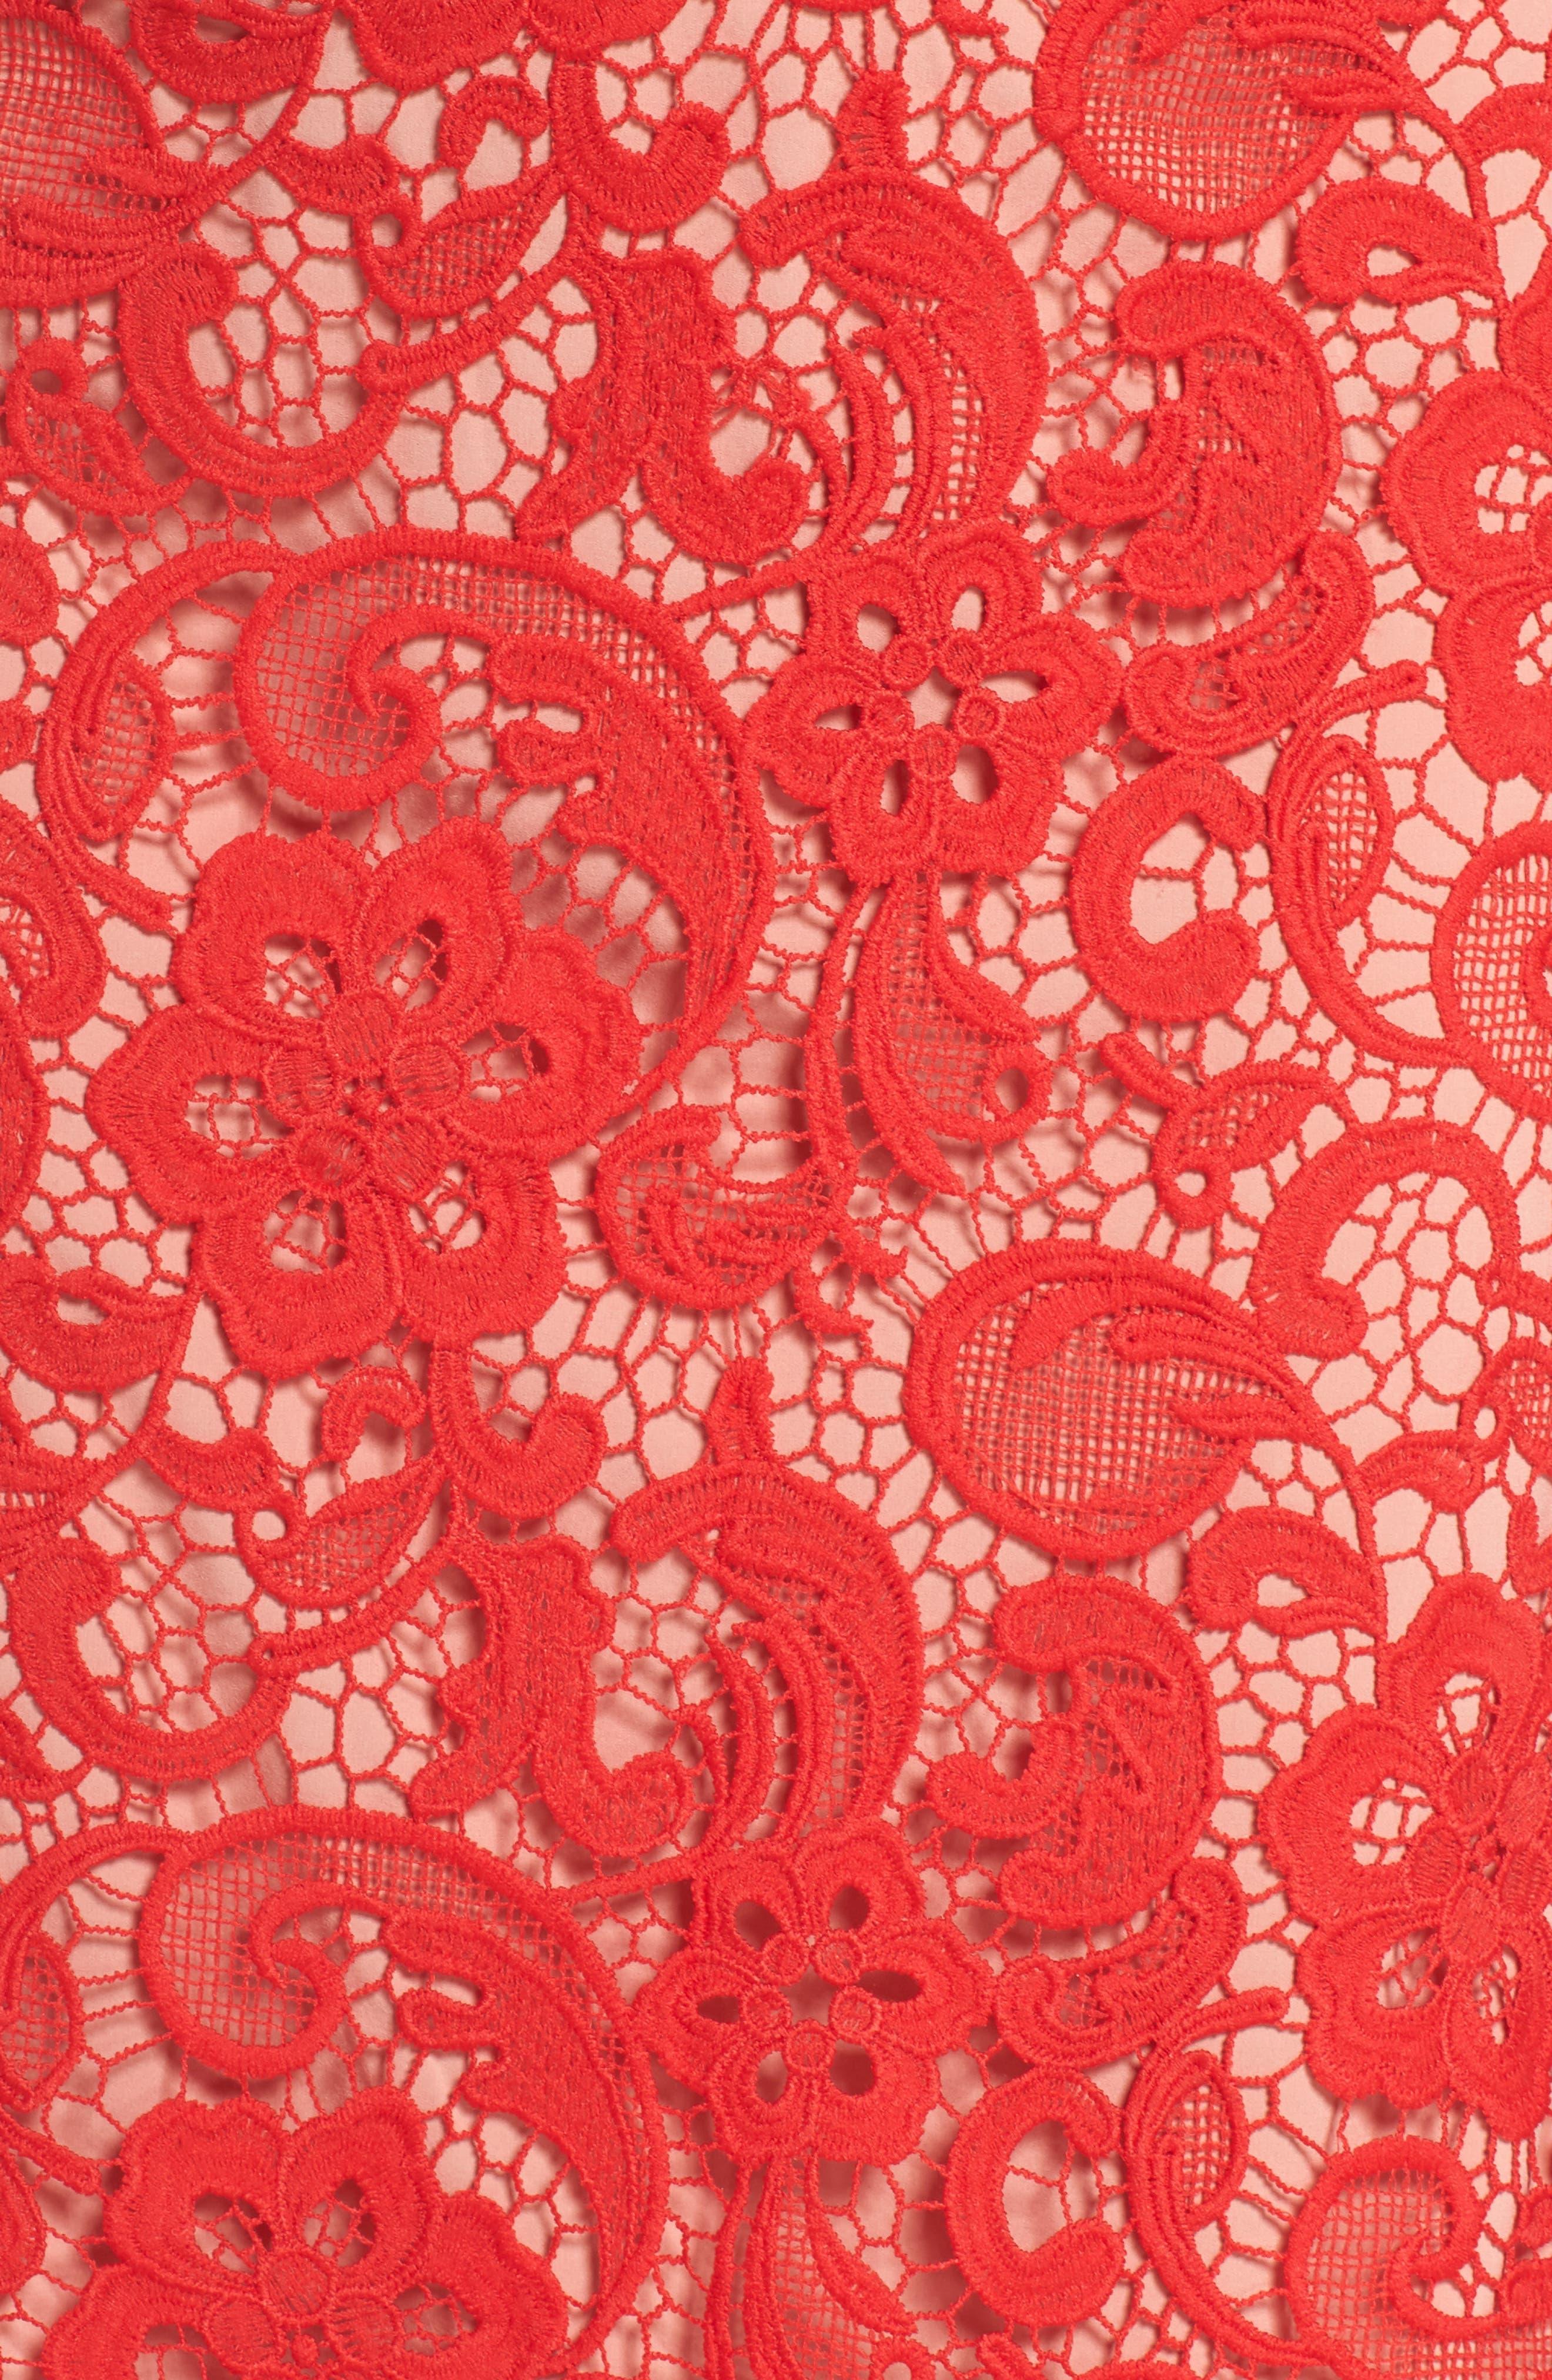 Carnation Lace Dress,                             Alternate thumbnail 5, color,                             600